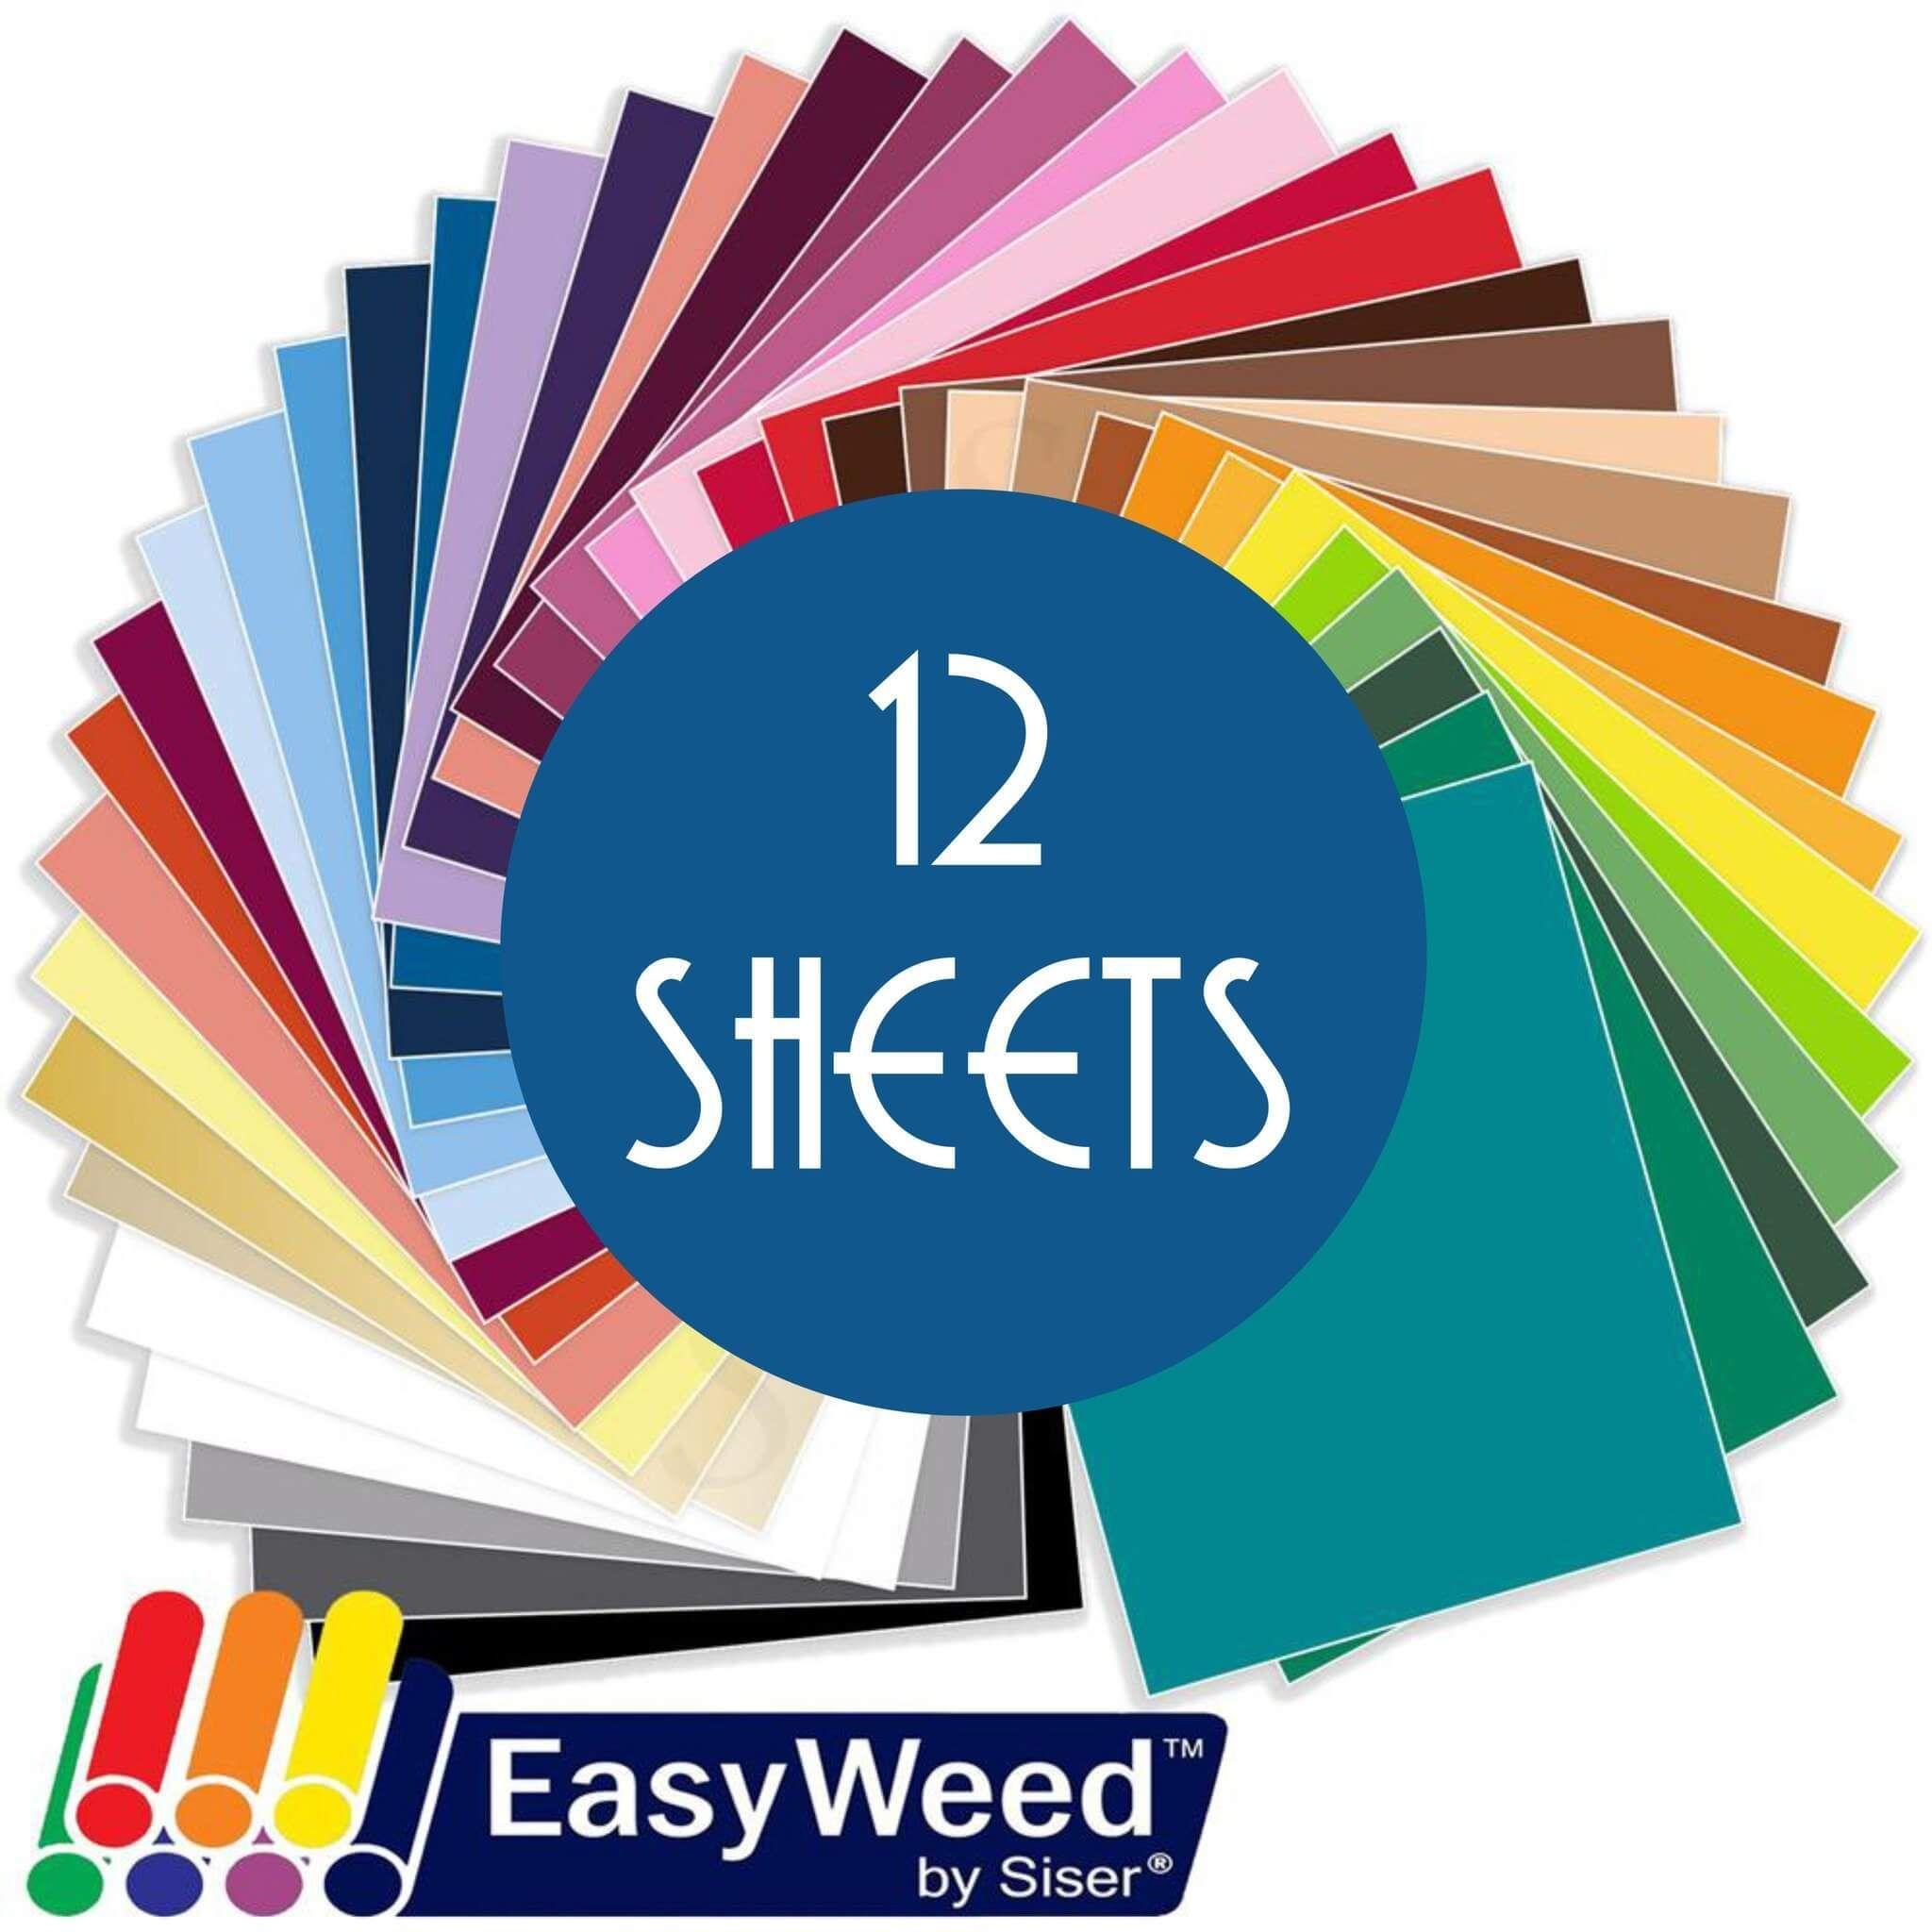 Siser Easyweed Heat Transfer Vinyl Htv 12 Sheets Build A Bundle 12 X 15 Siser Easyweed Oracal Vinyl Easyweed